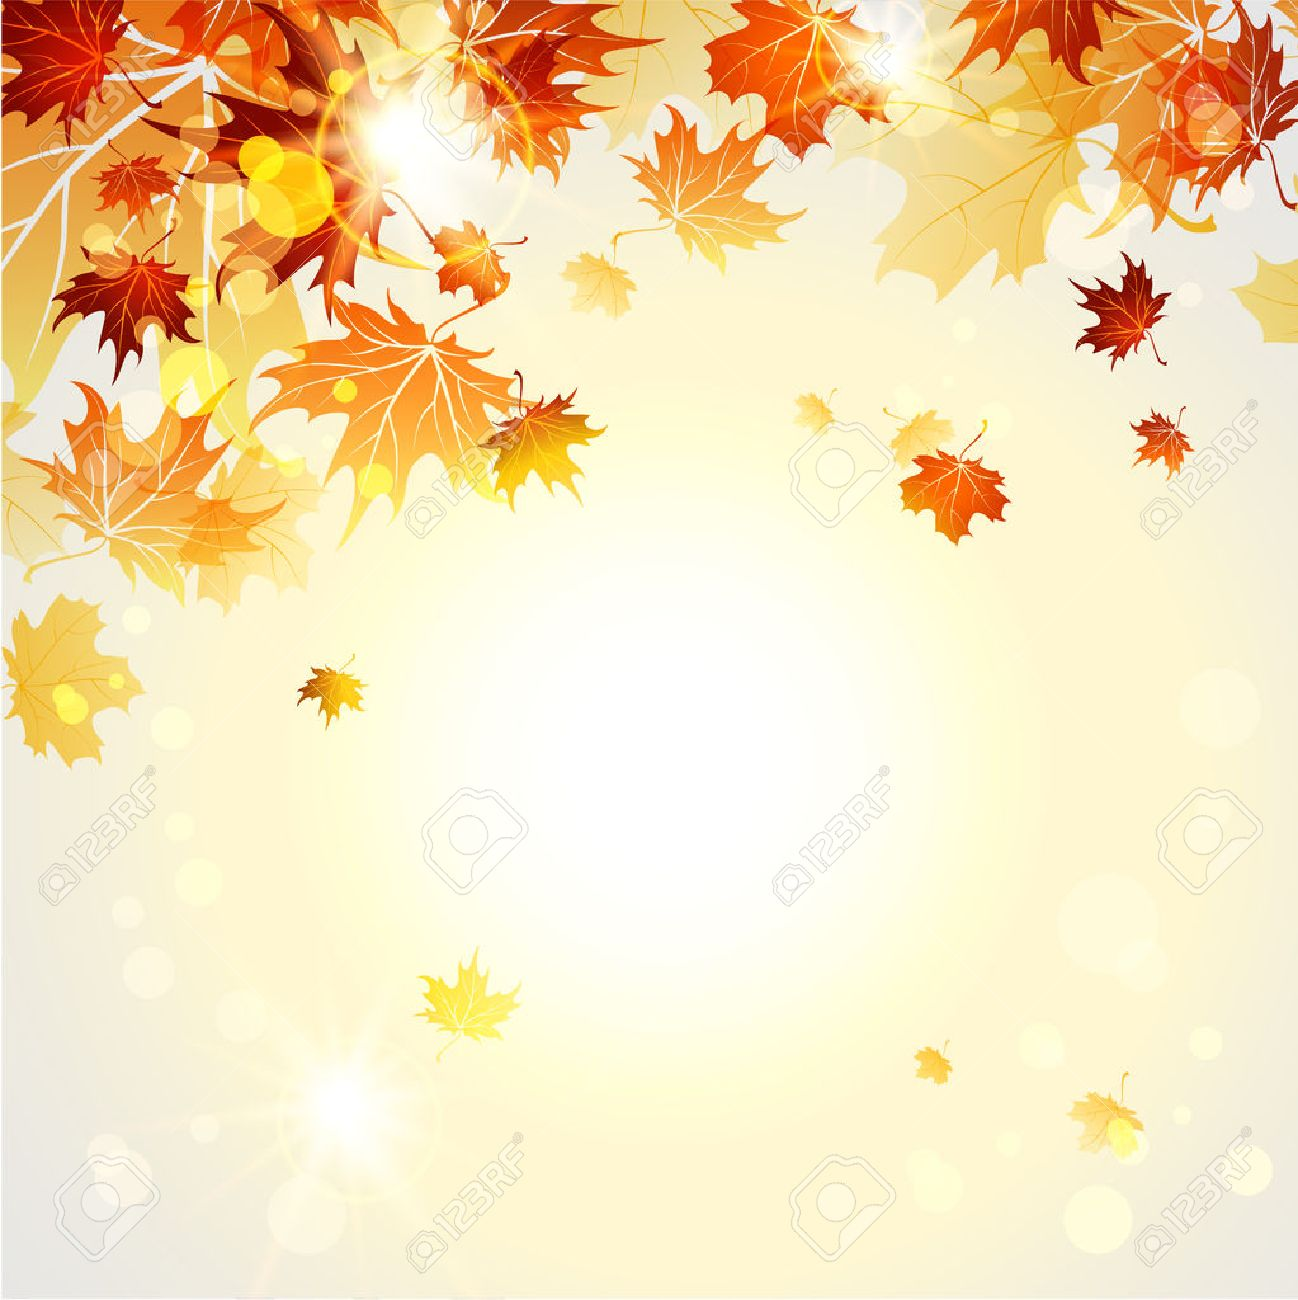 Картинки про осень фон